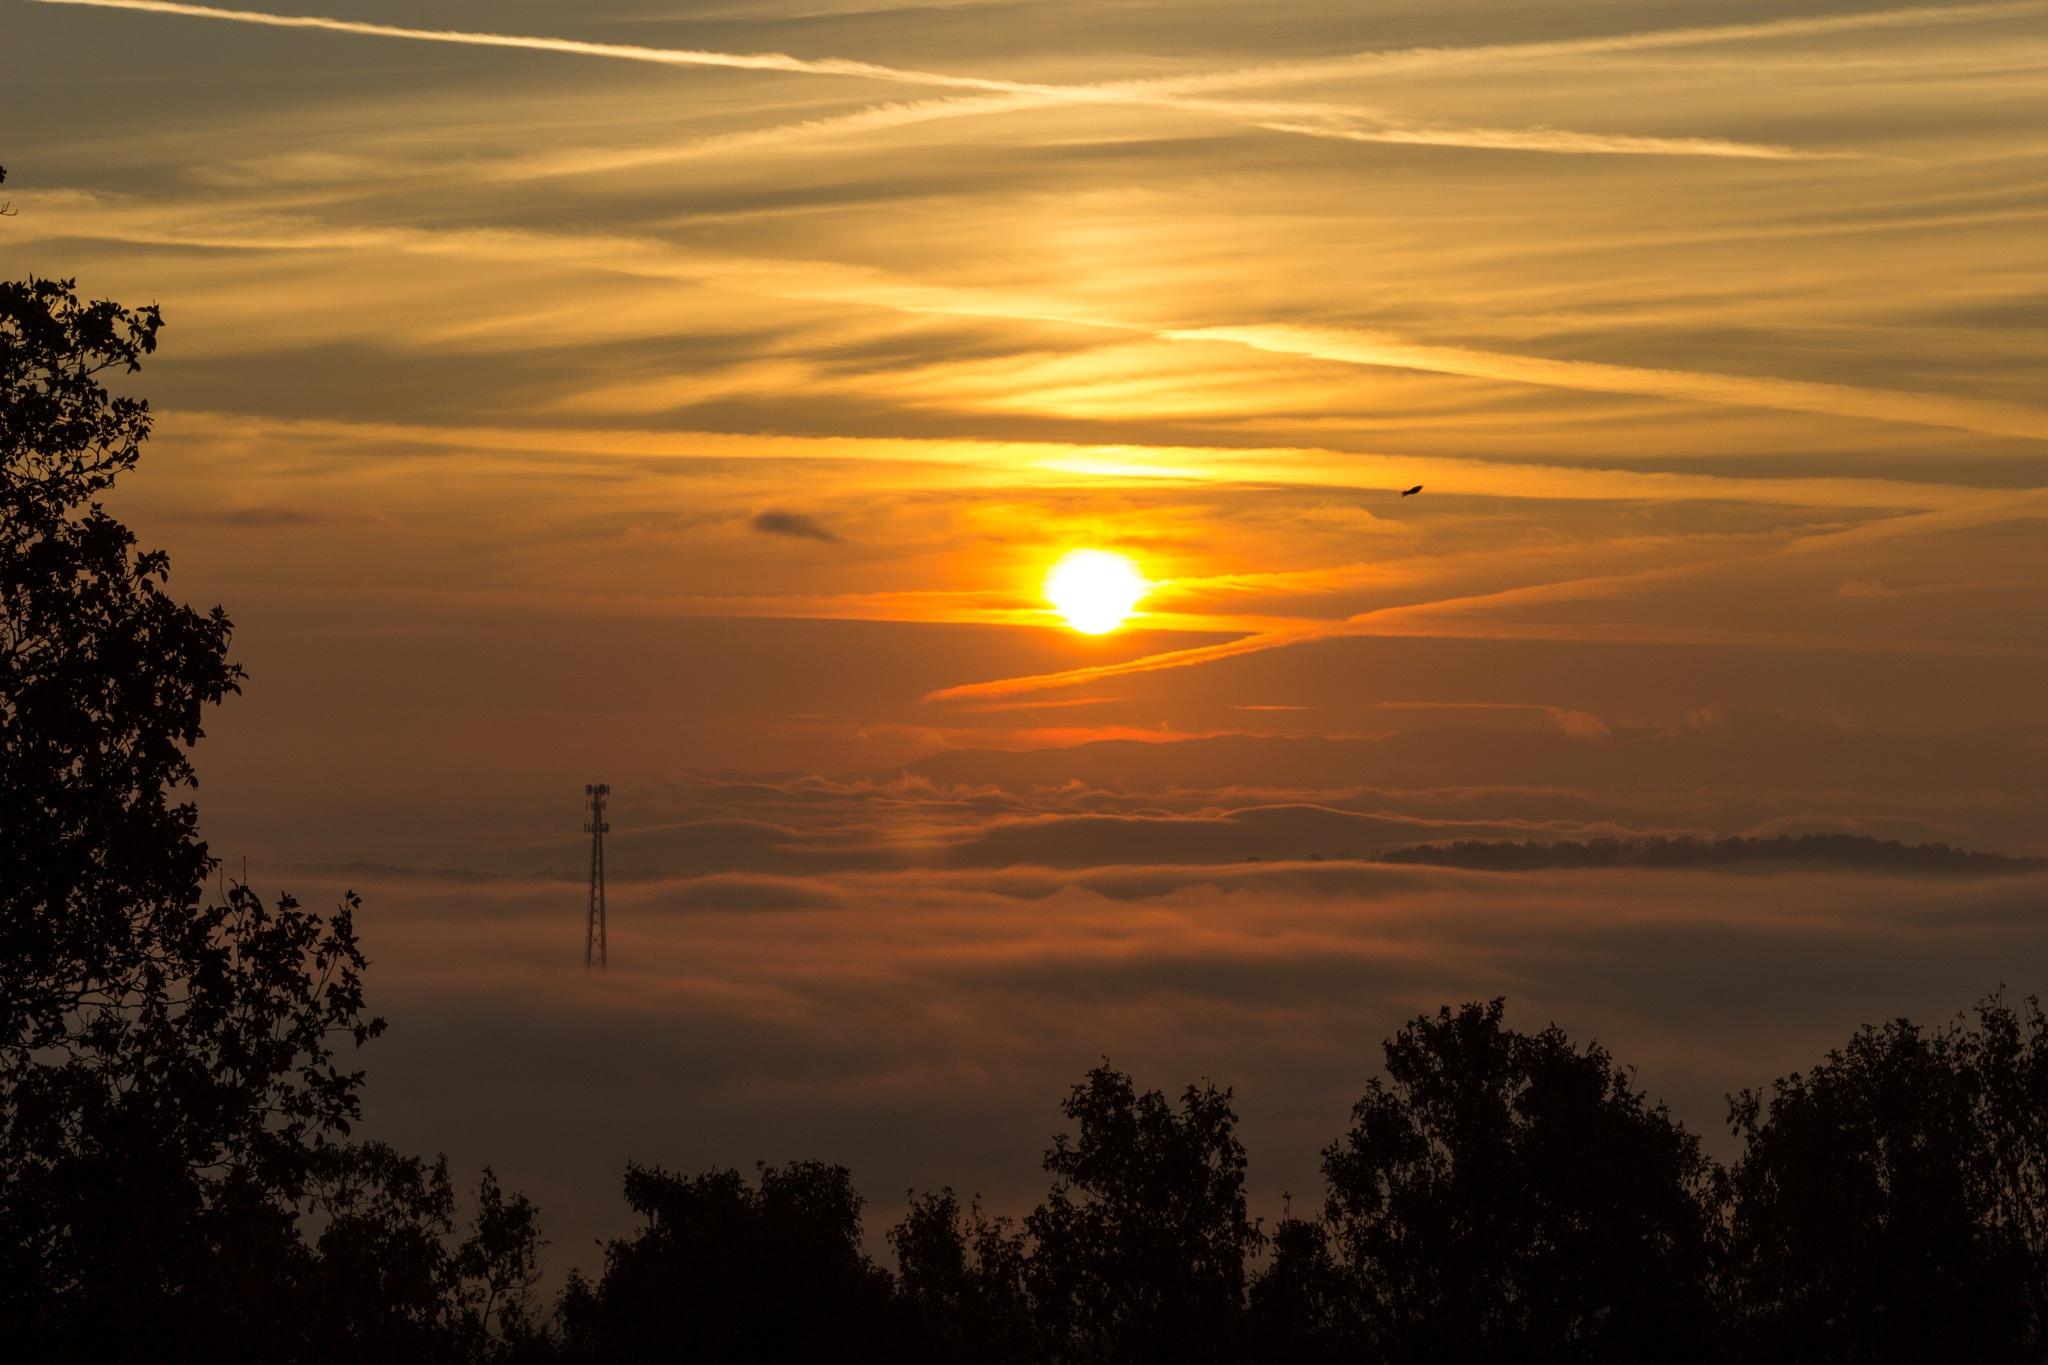 Cohutta Sunrise by Cameron Goins